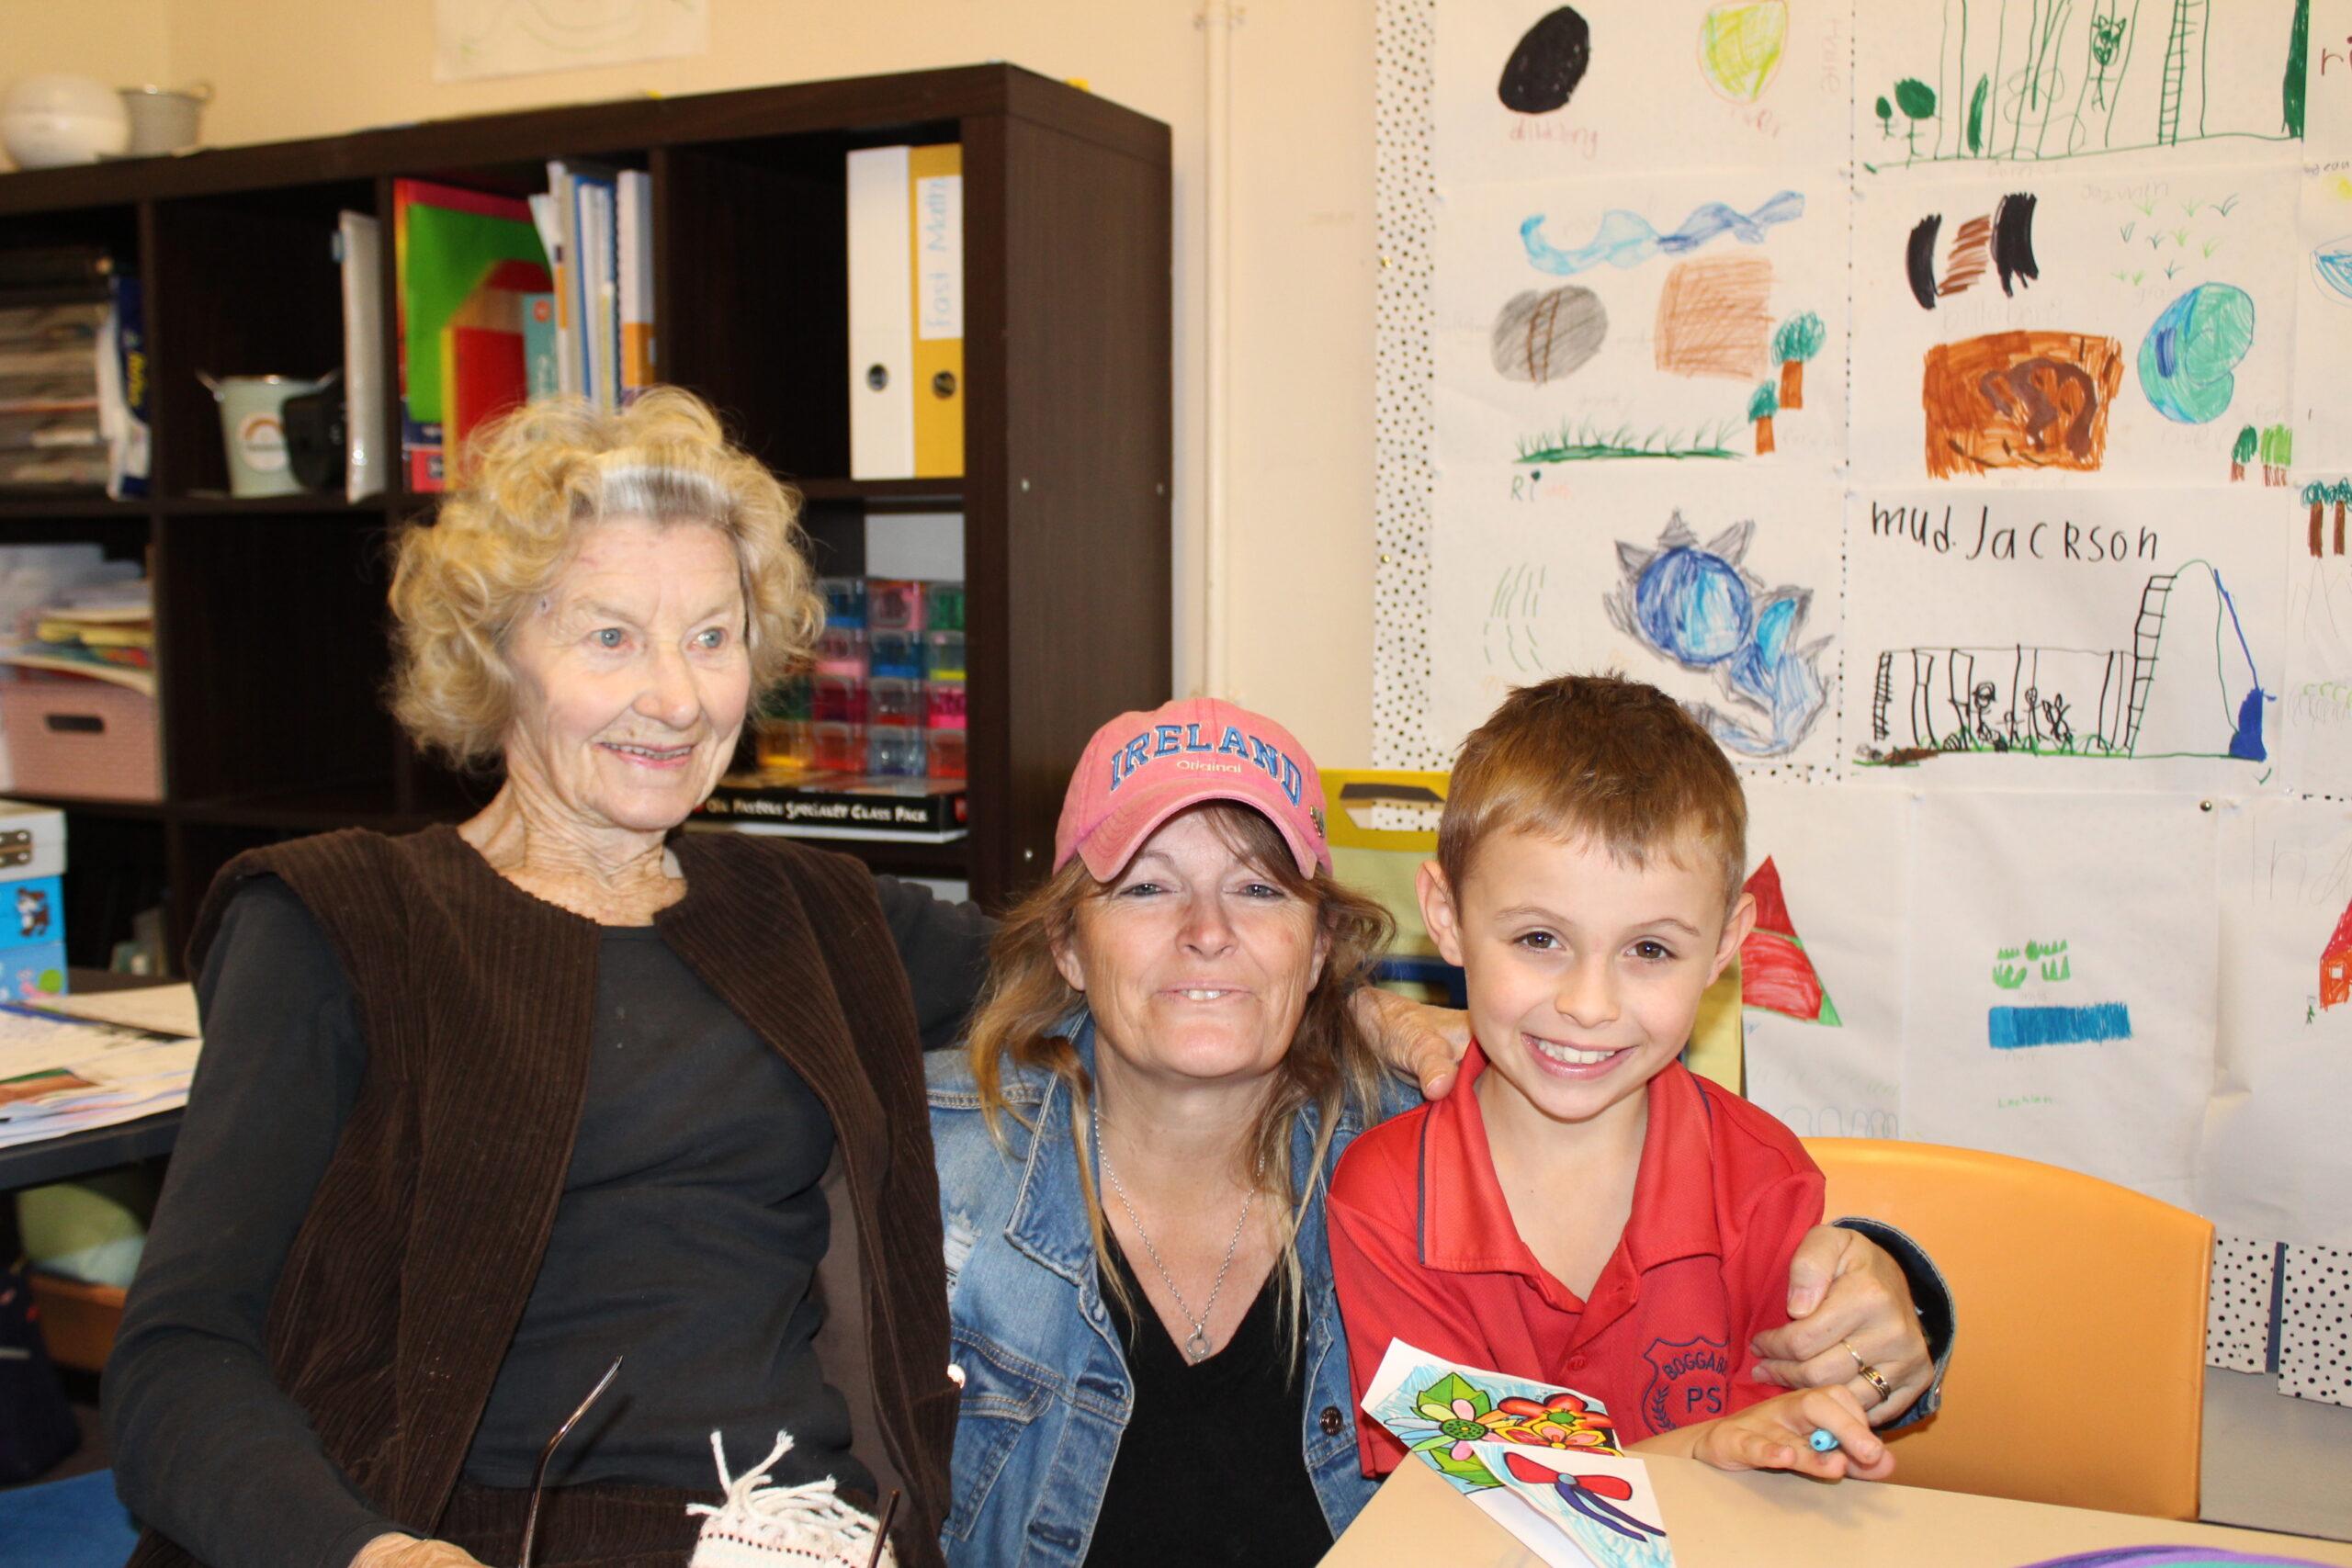 Beau Hobden had his great-grandmother Irene Hobden and grandmother, Nicky Hobden.